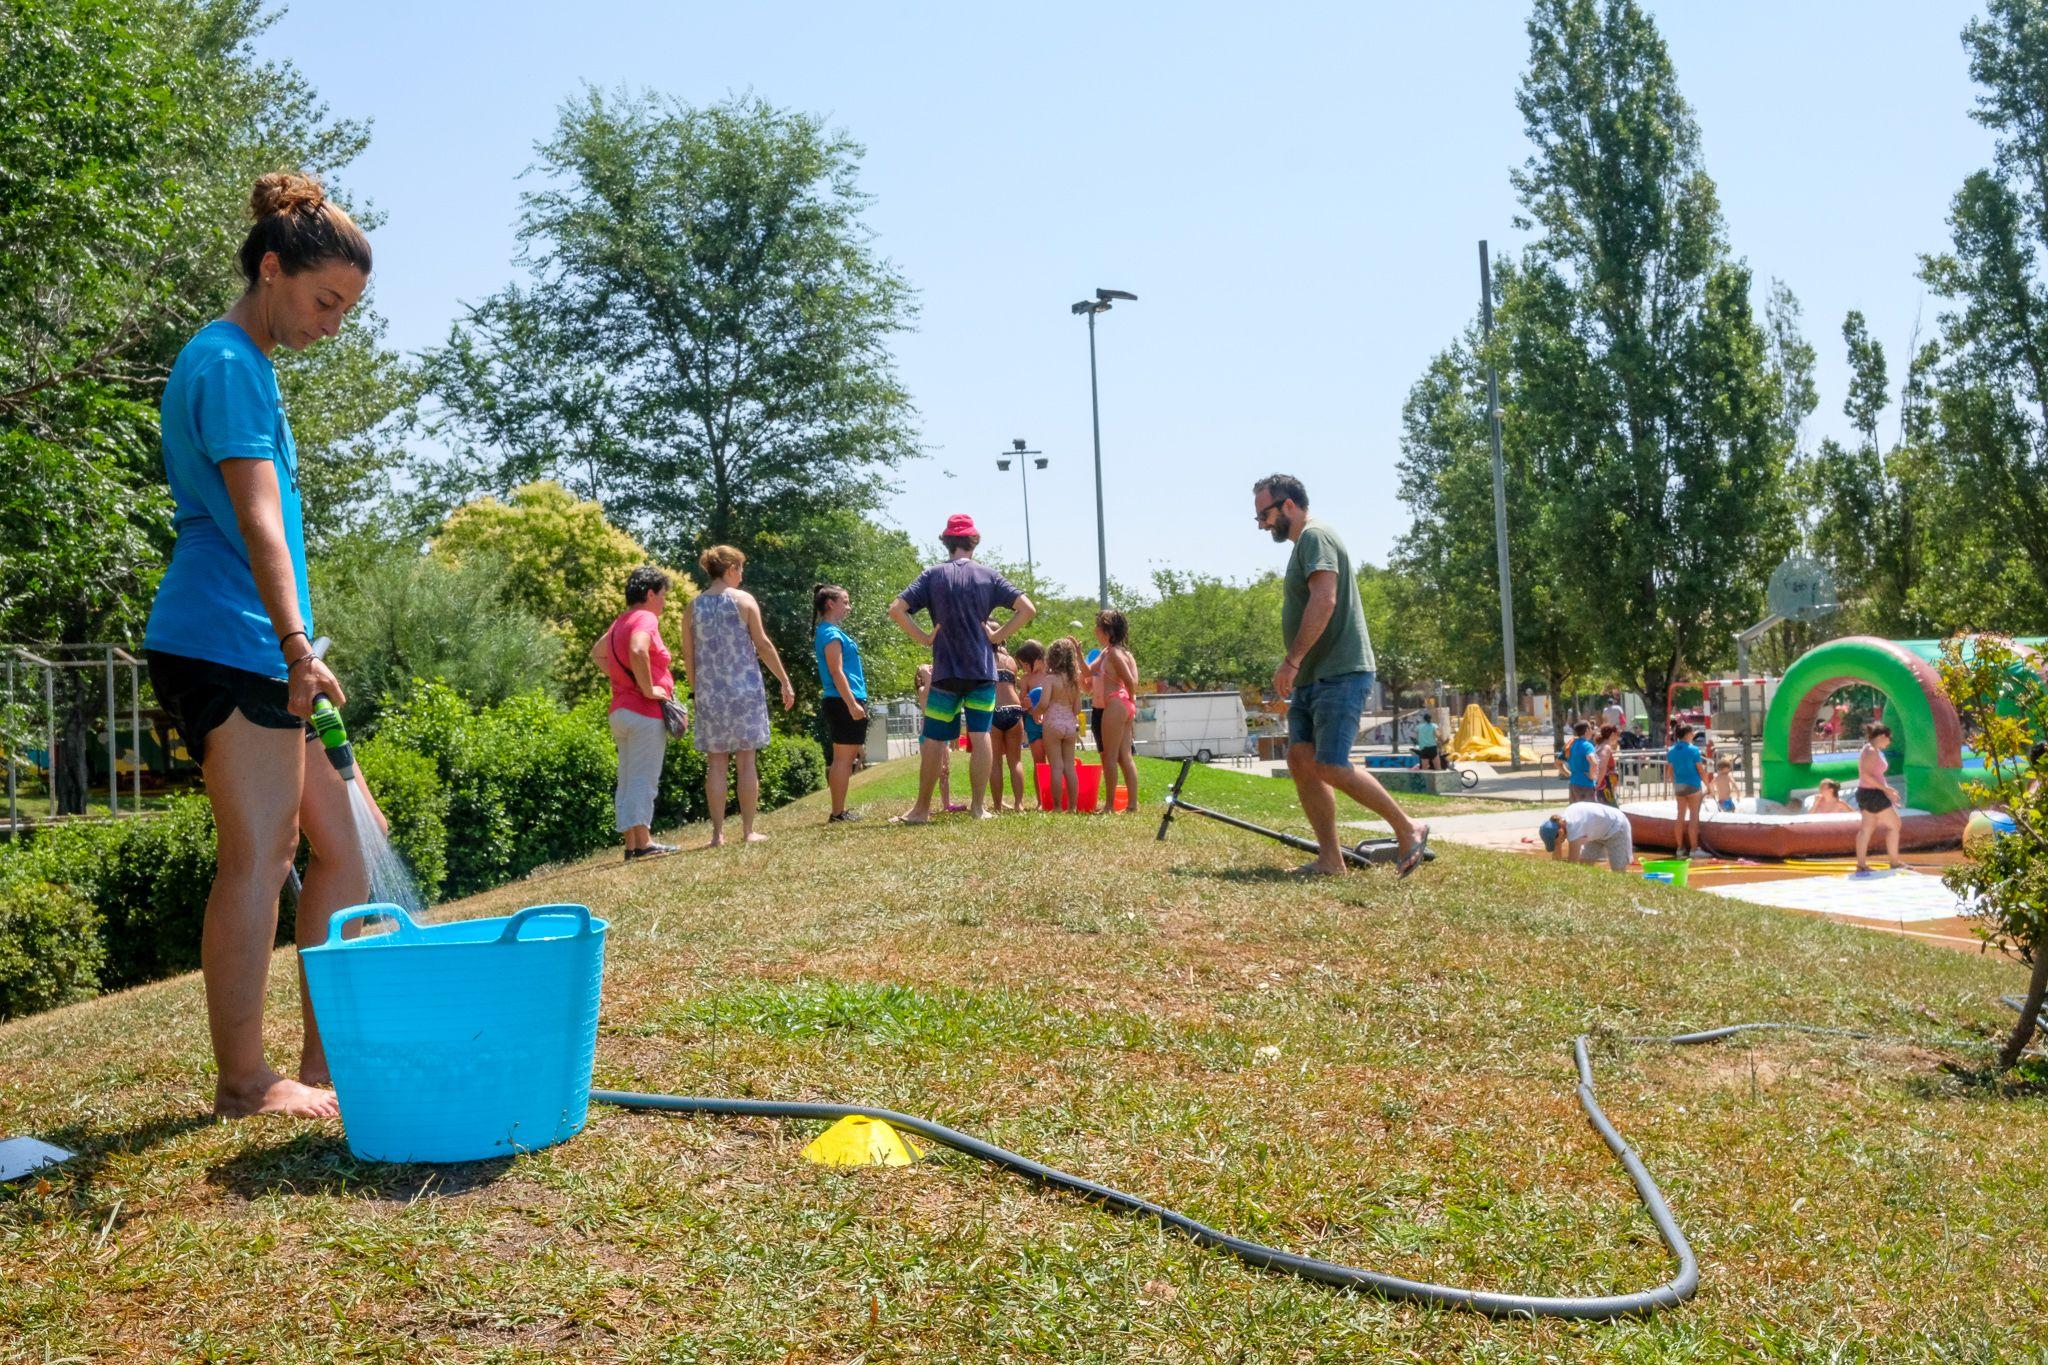 La festa de l'aigua de Festa Major Mira-sol. Foto: Ale Gómez